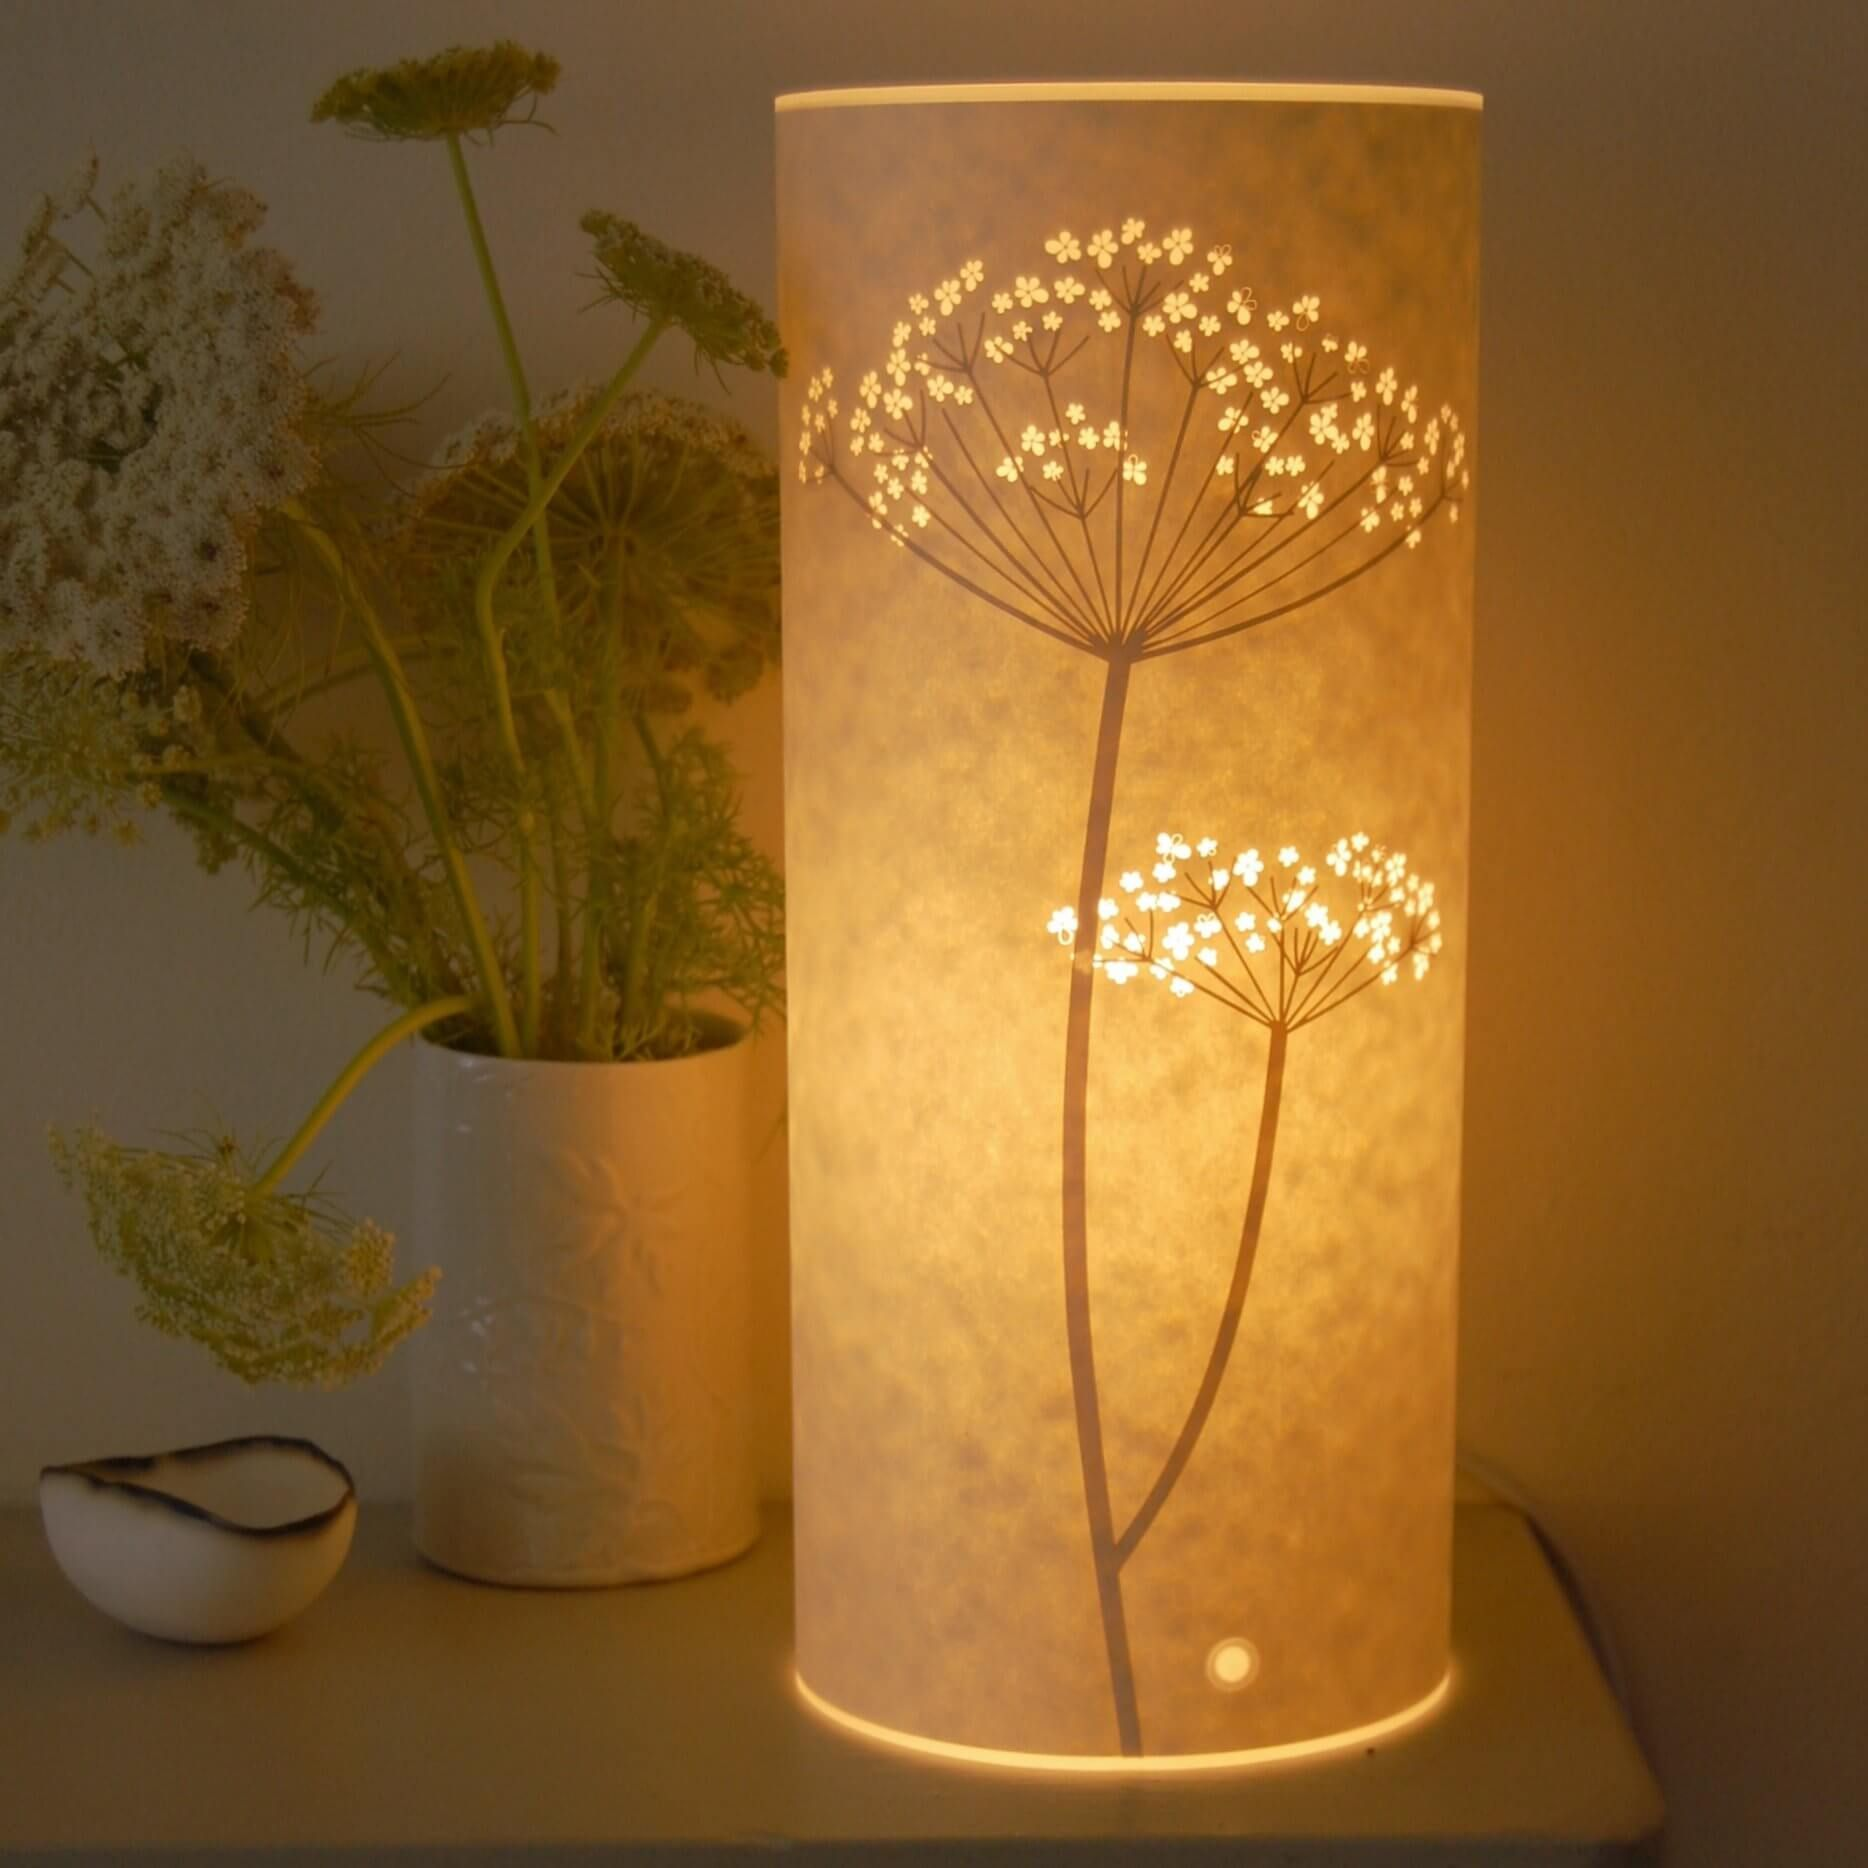 10 Adorable Handmade Night Light Designs For Good Fantasy Lamp